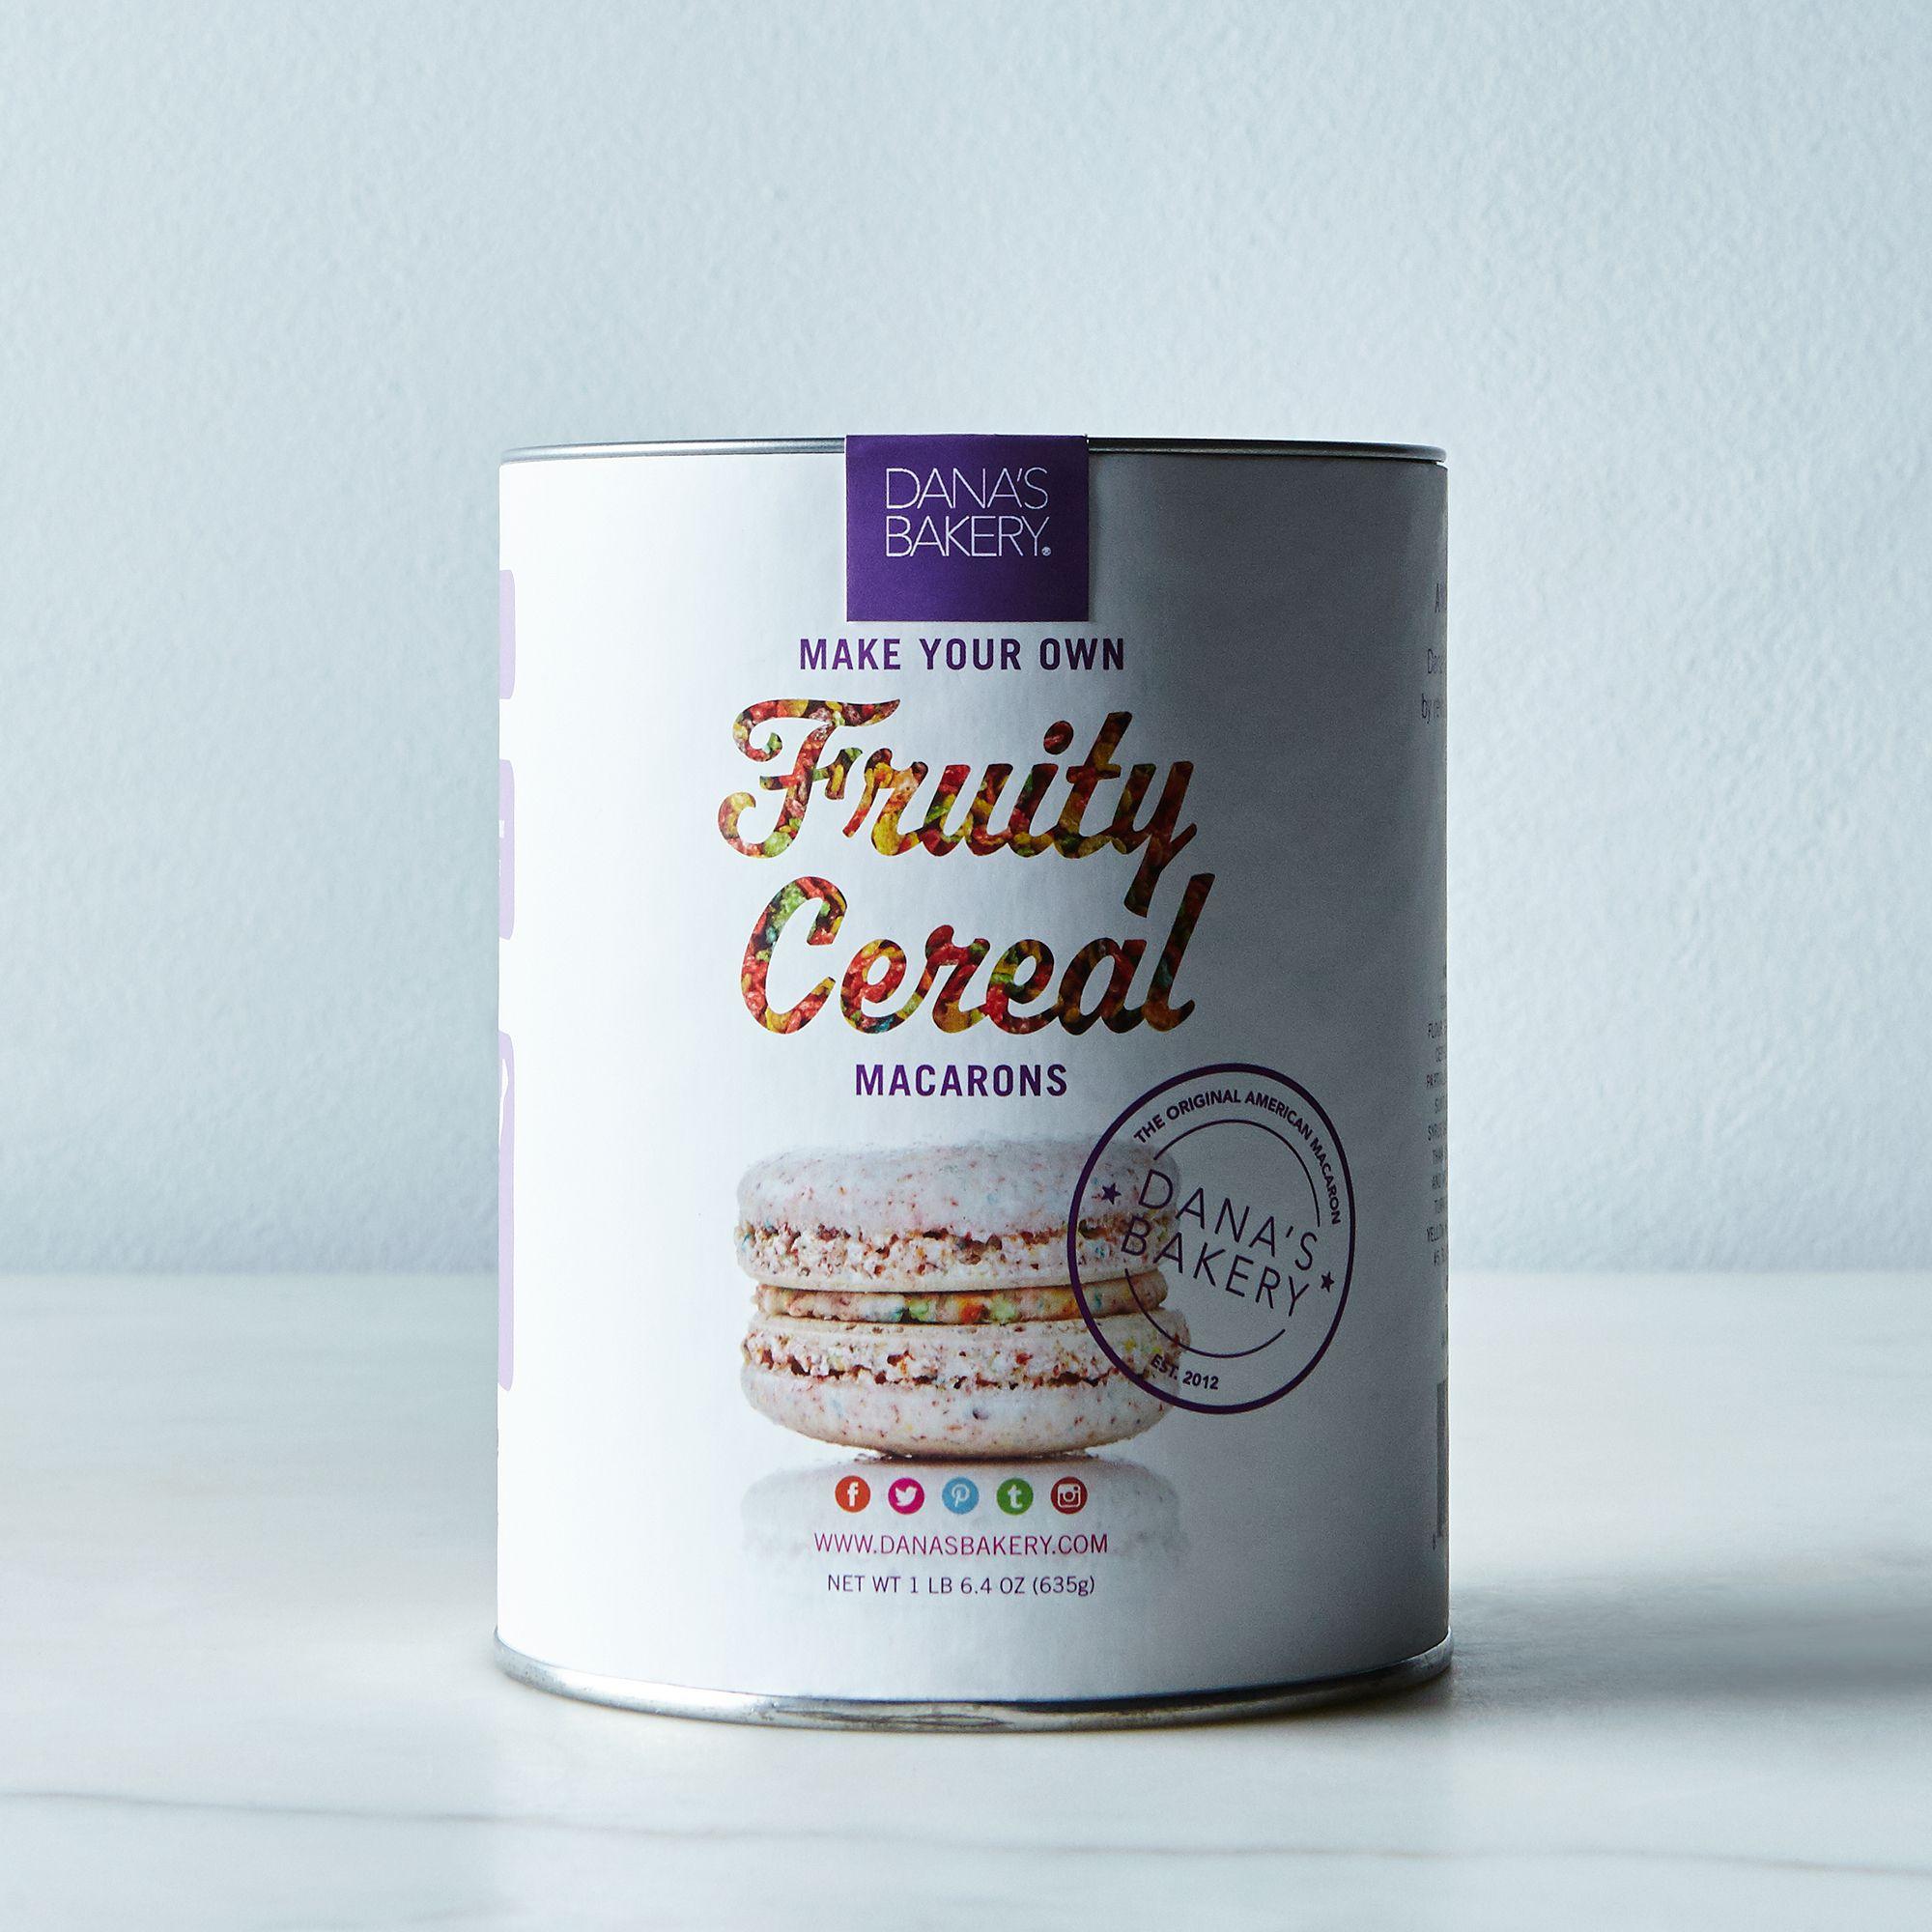 25d37ef2 a0f9 11e5 a190 0ef7535729df  2015 1015 danas macarons diy macaron kit fruity cereal silo rocky luten 002